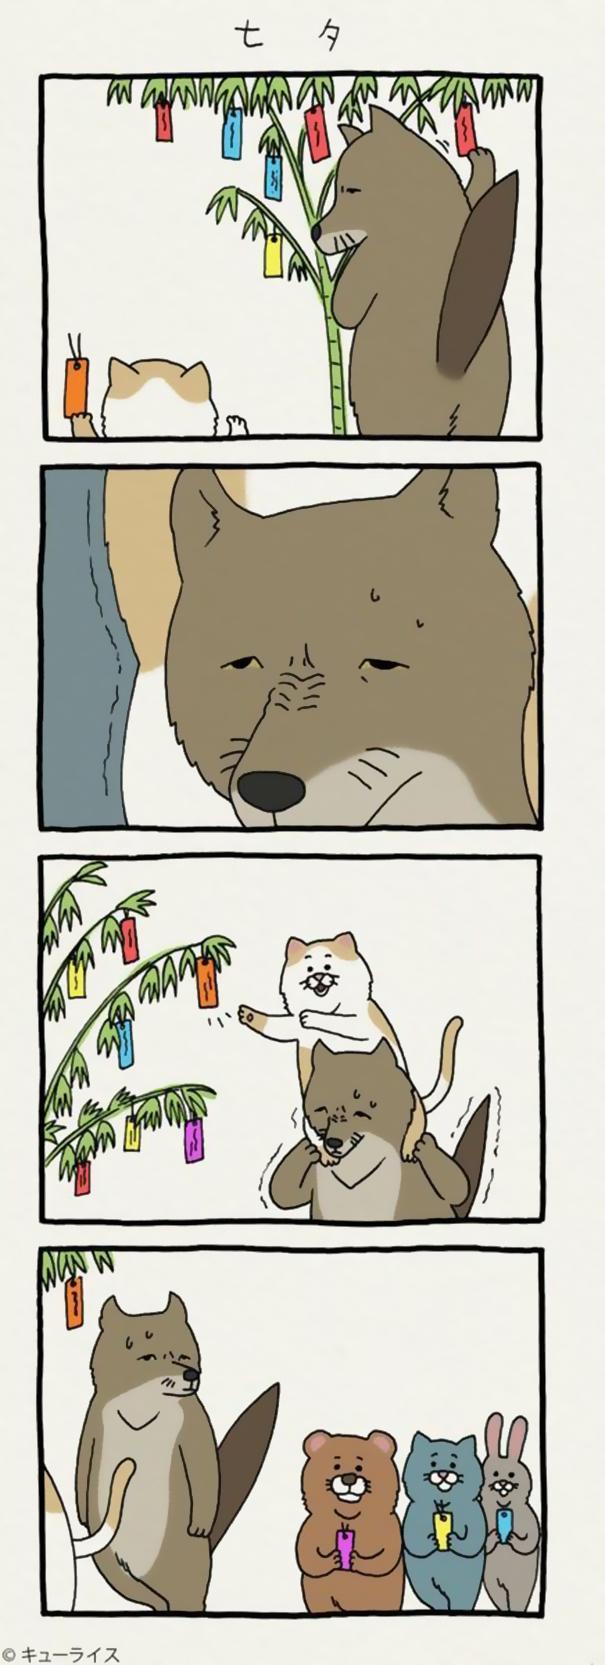 dog cartoon comics qrais japan 7 59895b2fde758  605 - 우울한 당신을 웃게 해줄 '착한 티벳 여우' 4컷 만화